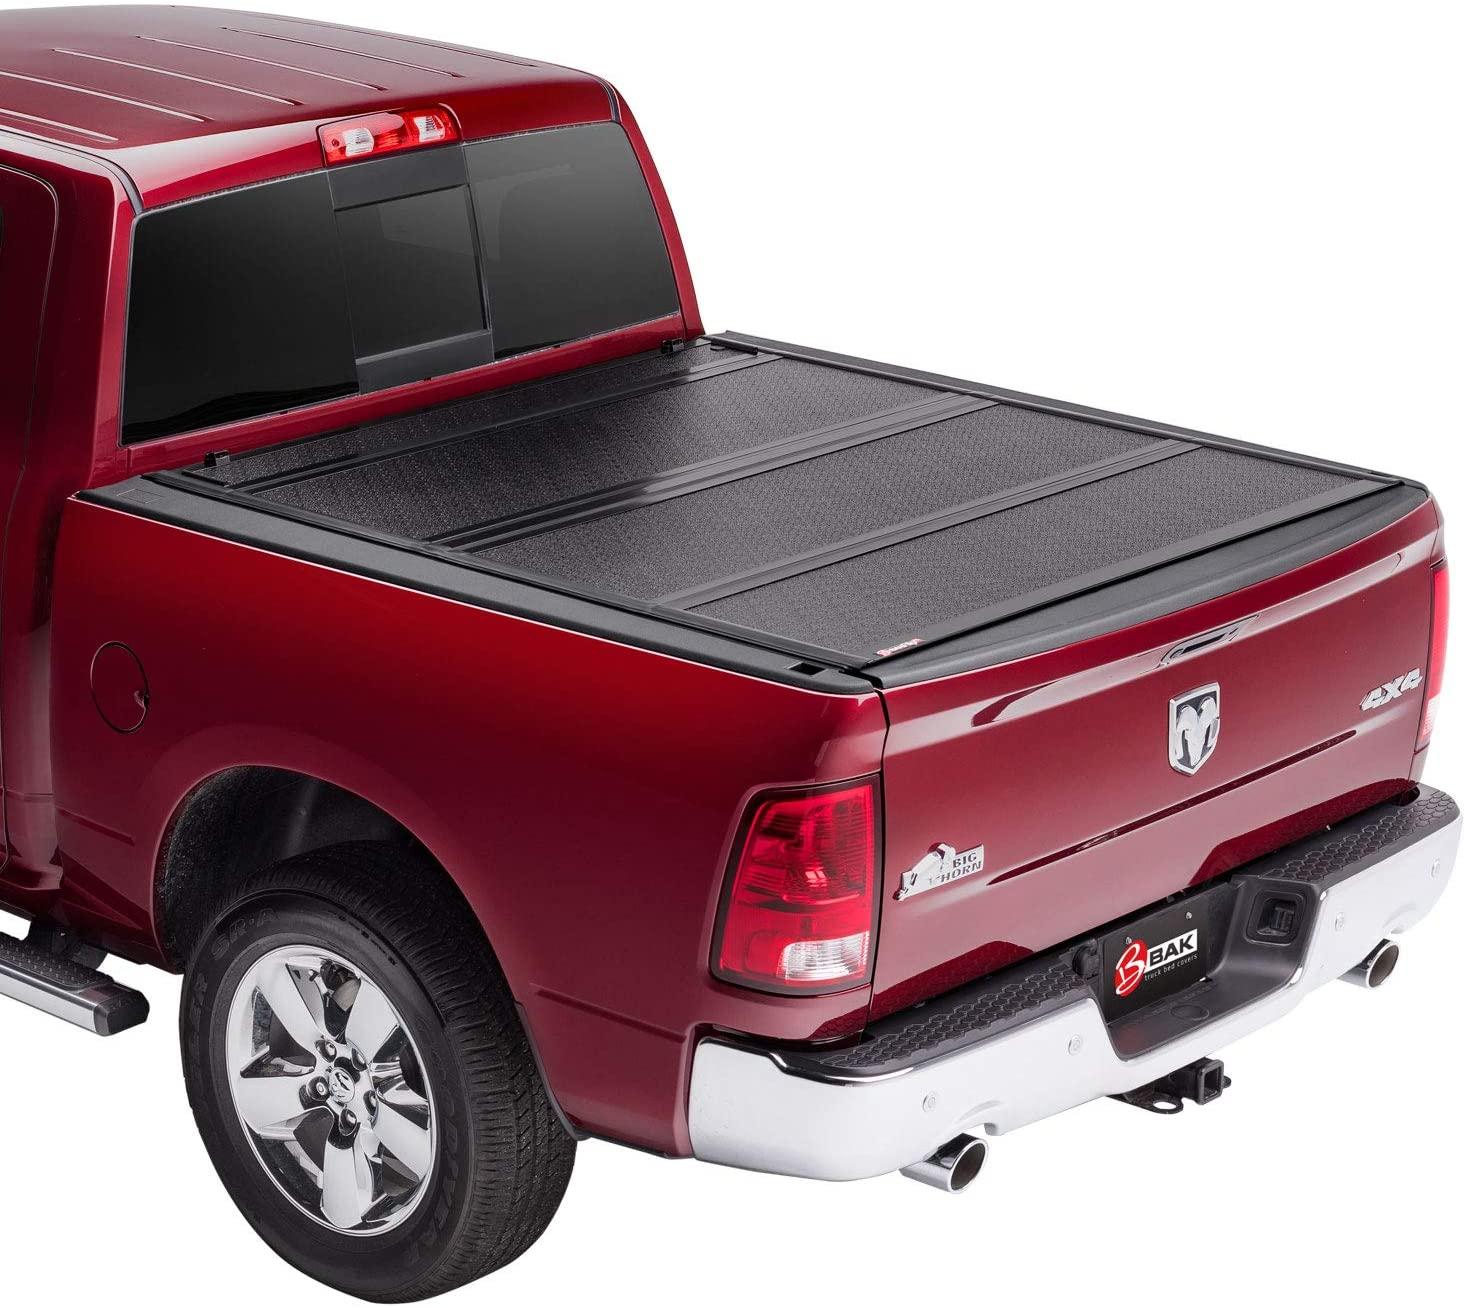 BAK BAKFlip F1 Hard Folding Truck Bed Tonneau Cover | 772204 | Fits 2002-20 Dodge Ram 8' Bed